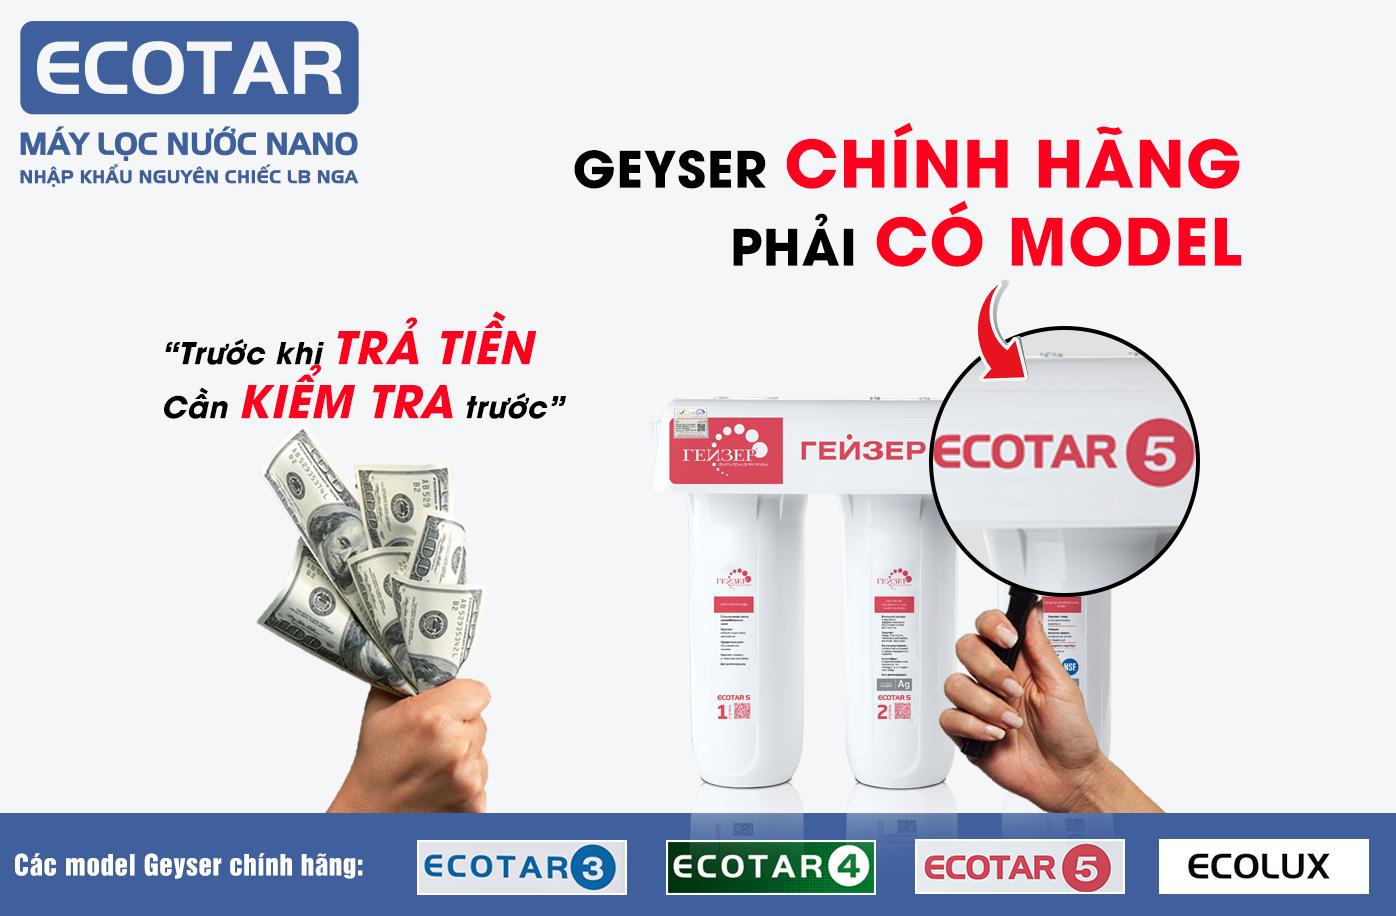 Geyser Ecotar 5 chính hãng